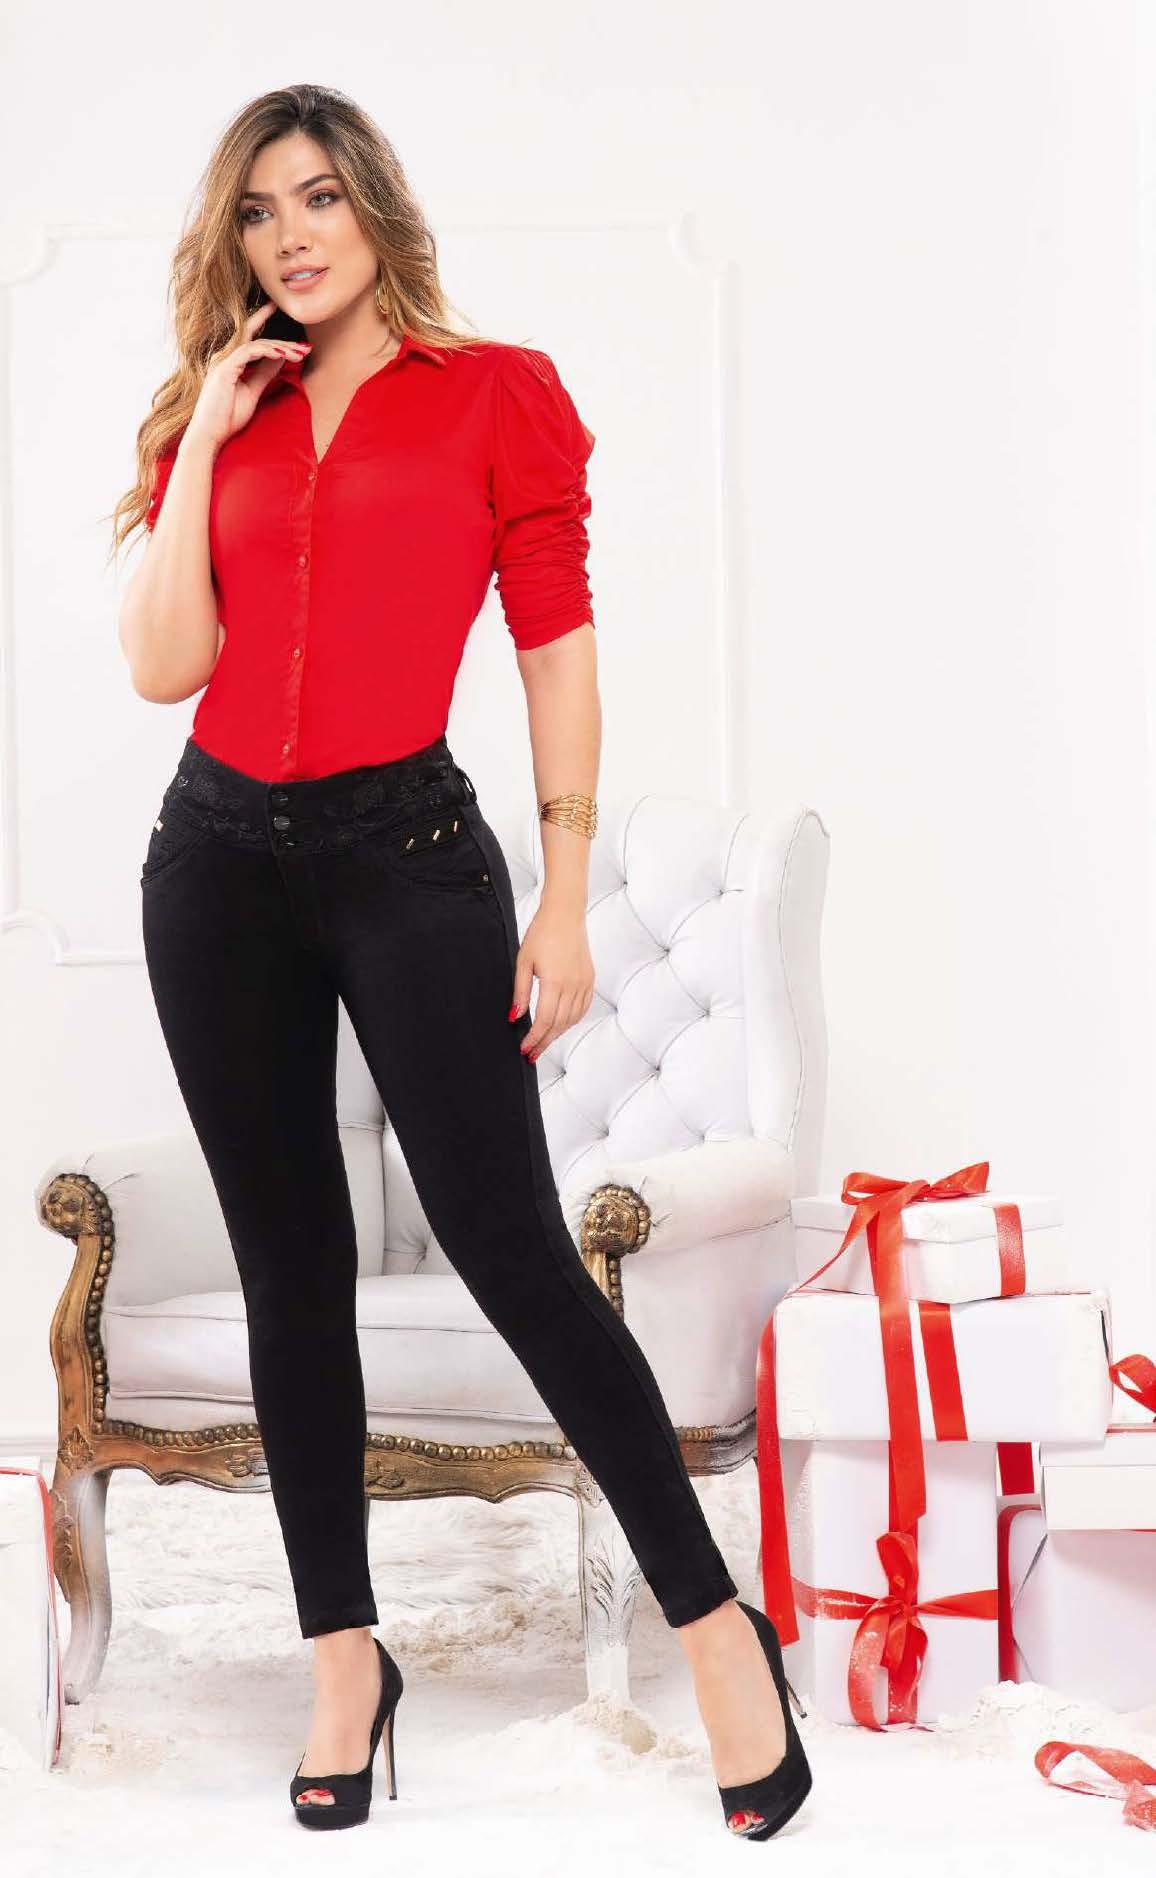 BJV jeans_Page_15_Image_0002